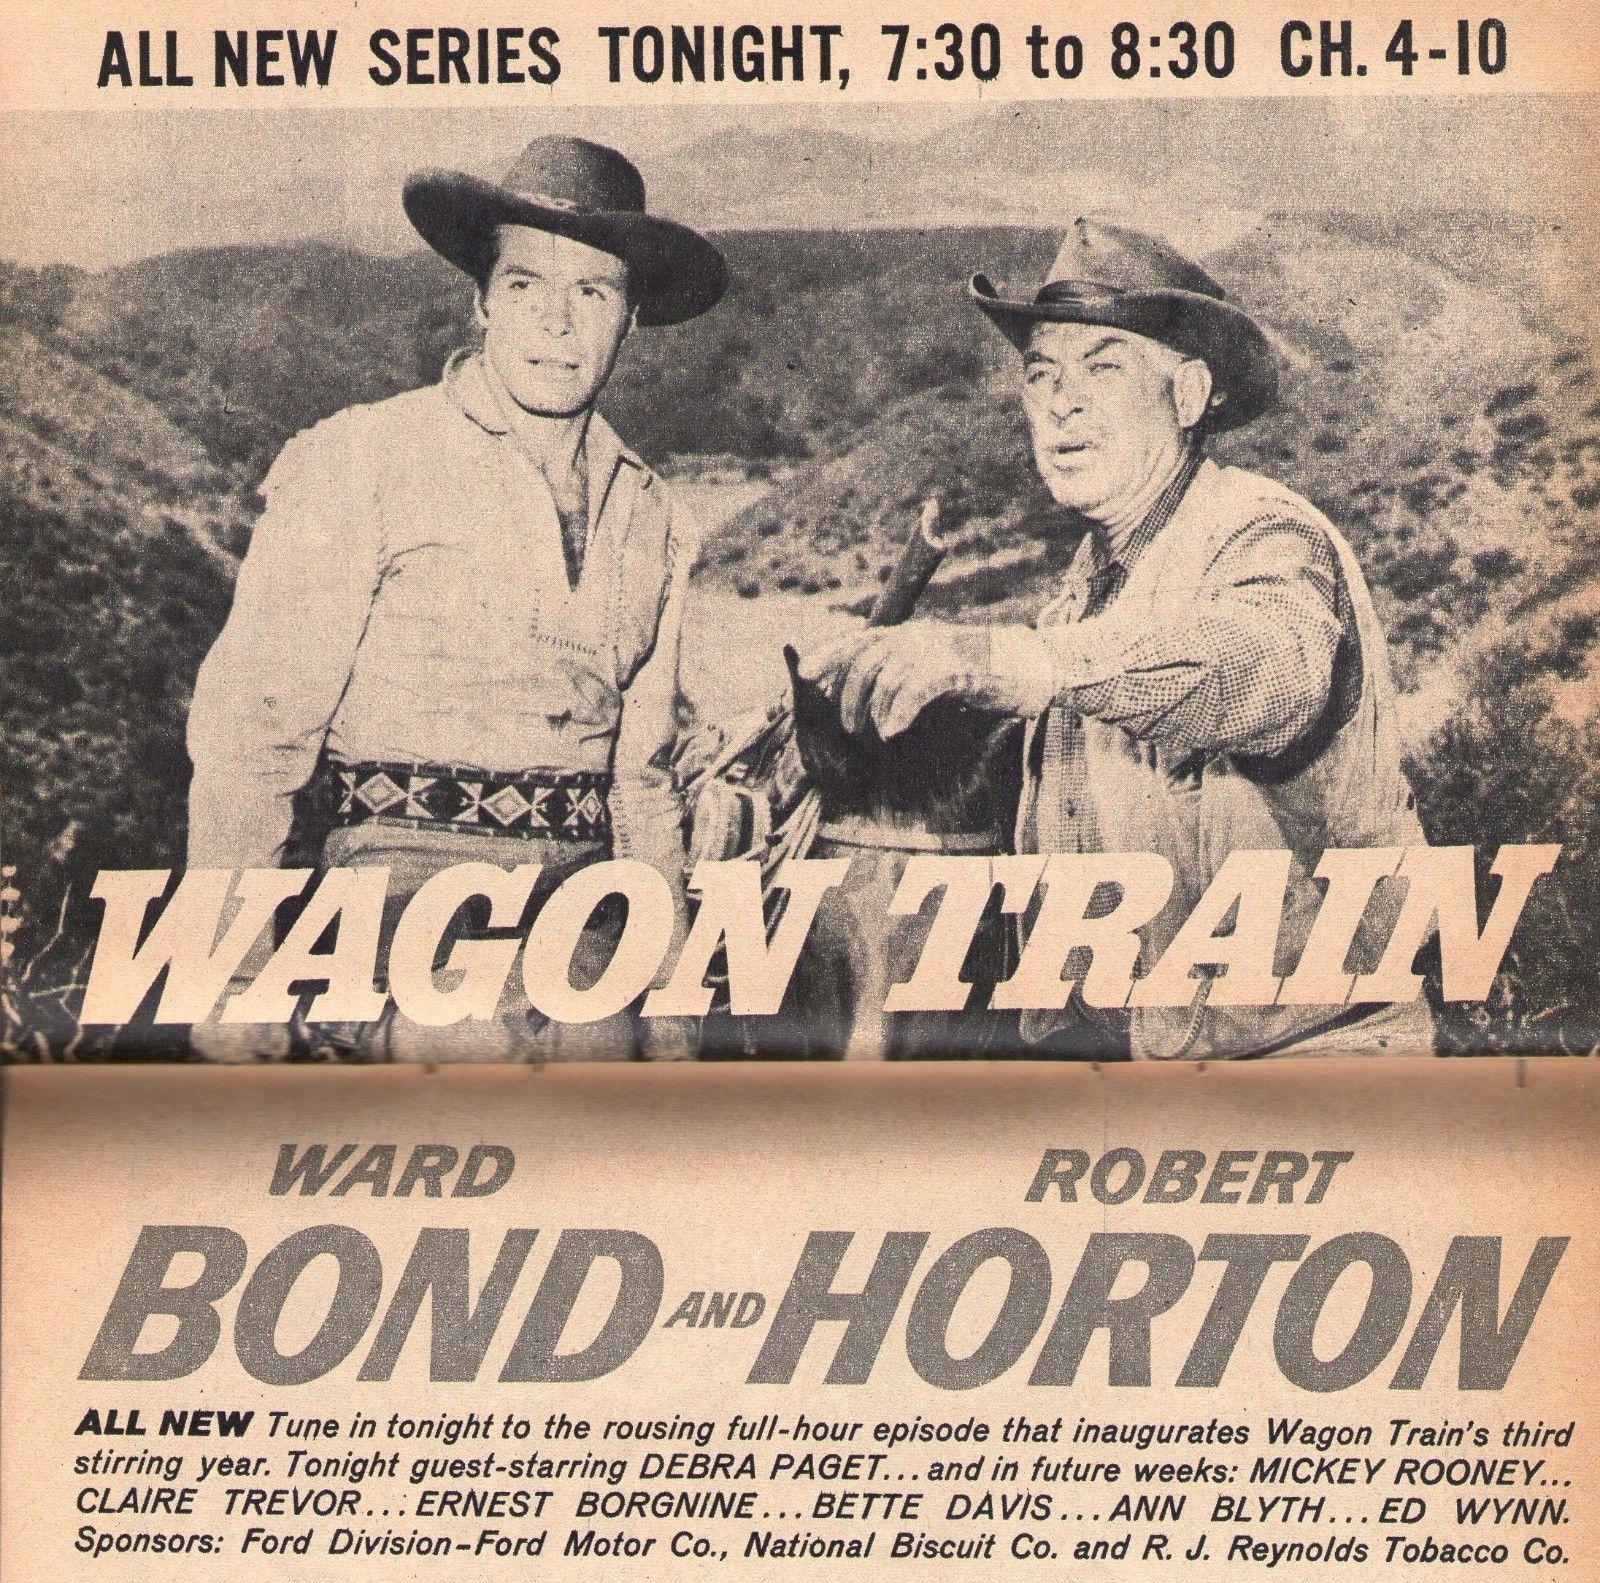 1959 TV ARTICLE~WAGON TRAIN PREMIERE~ROBERT HORTON WARD BOND~TELEVISION WESTERN | eBay